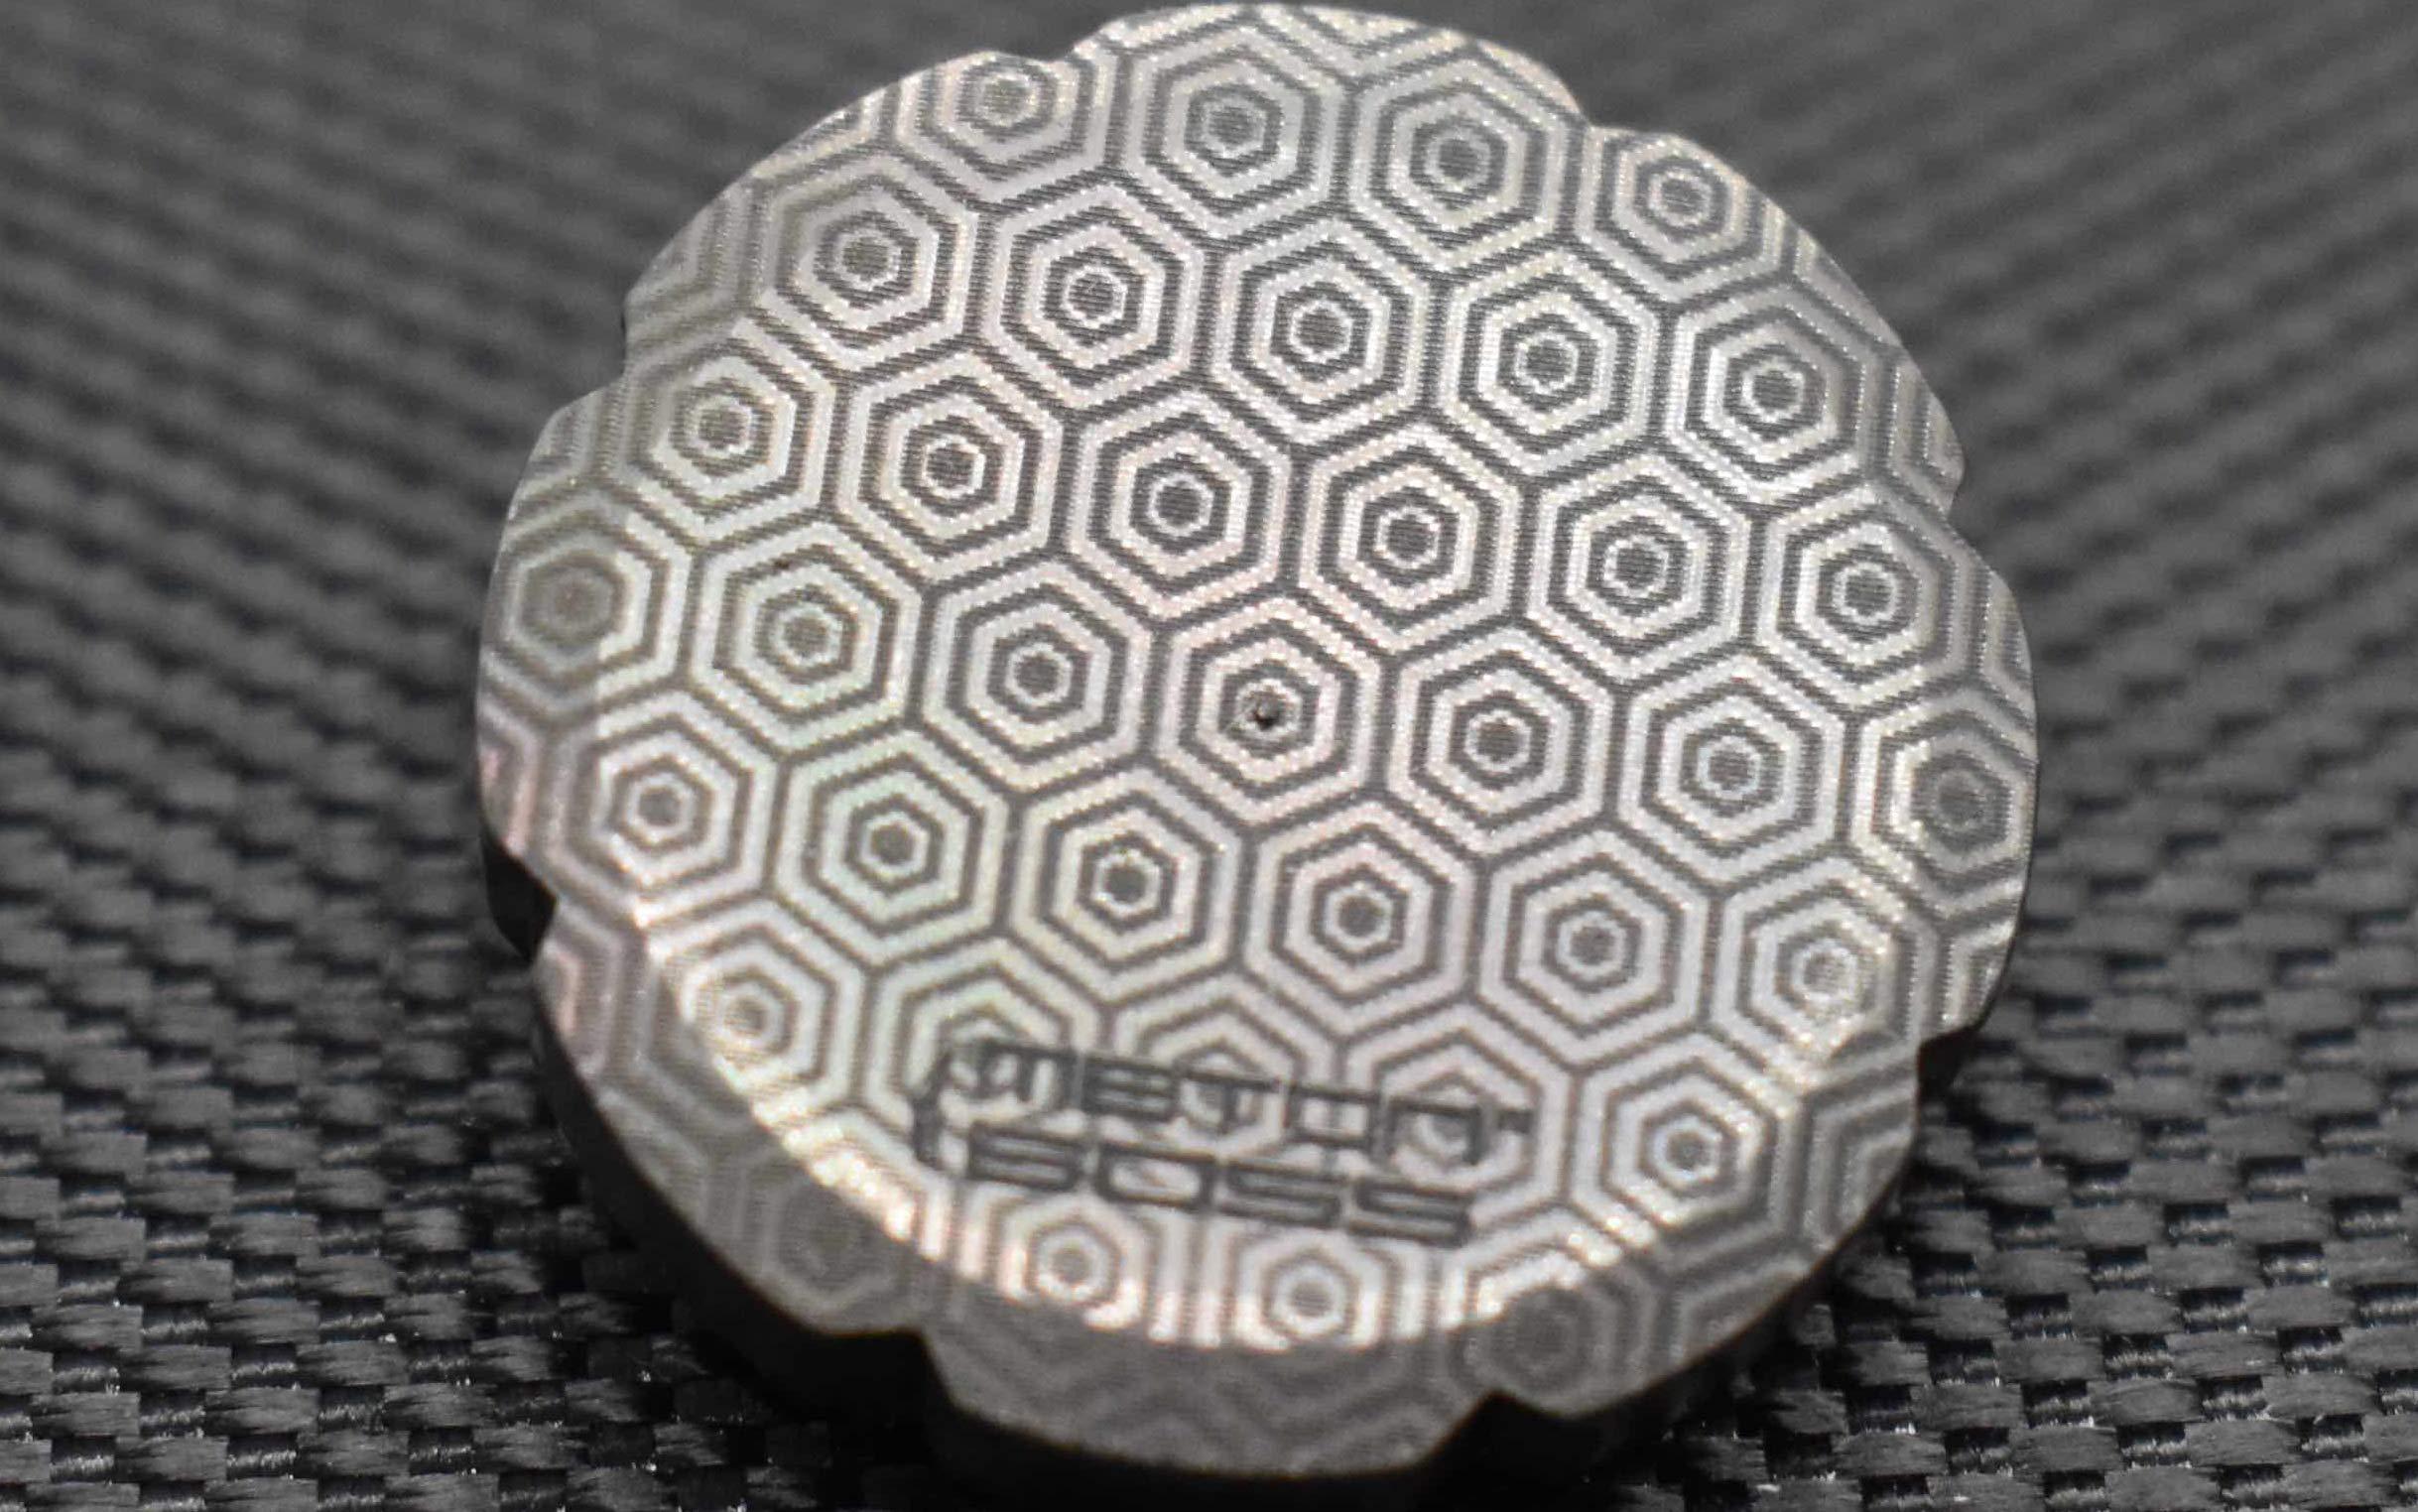 MetonBoss Worry Coin Black Zirconium & Ruby Bearing   Everyday Carry Gear   Precision-Made and Desktop Display by MetonBoss (Image #3)